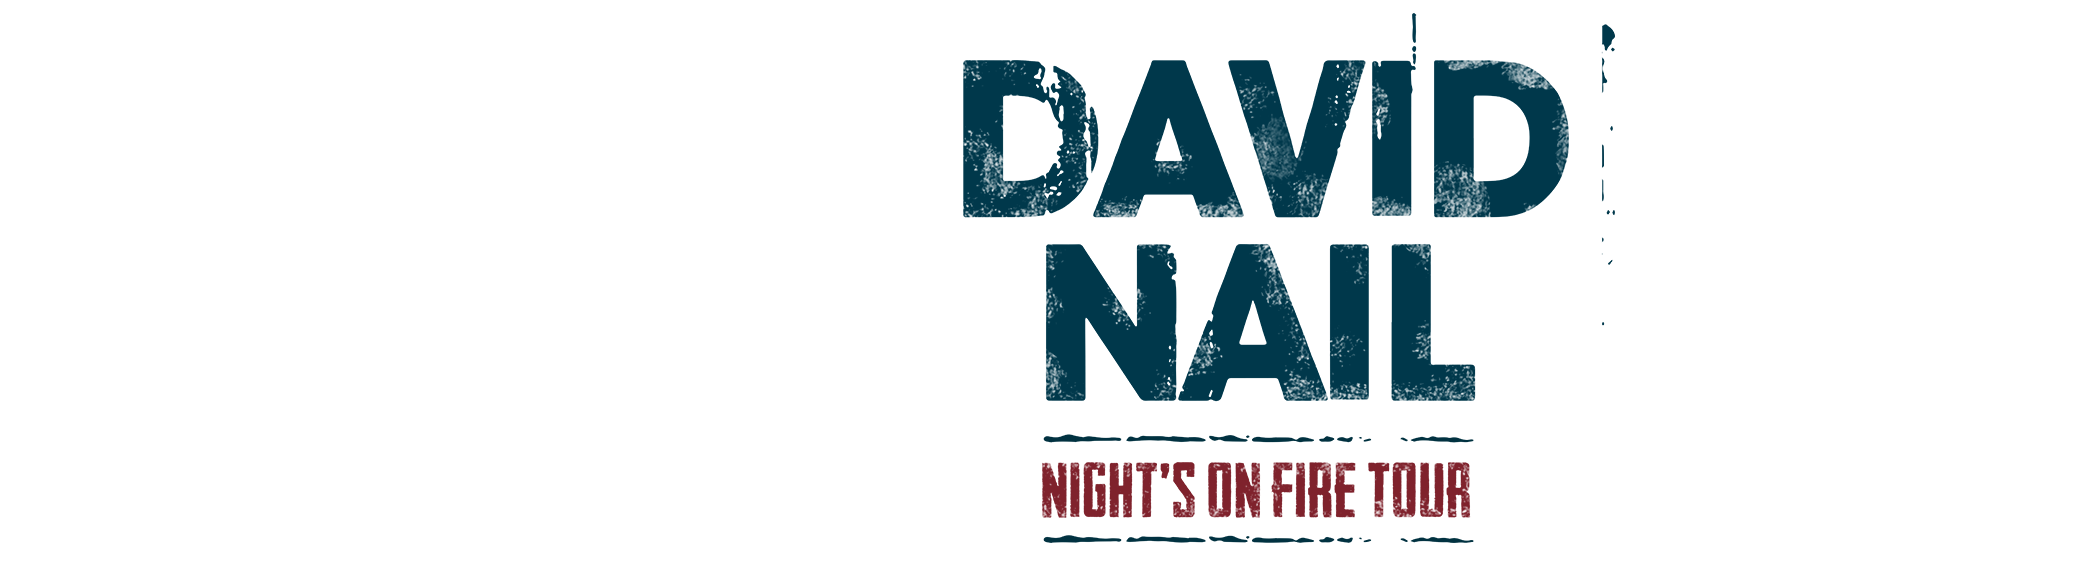 David Nail Nights On Fire Tour 2016 Cid Entertainment